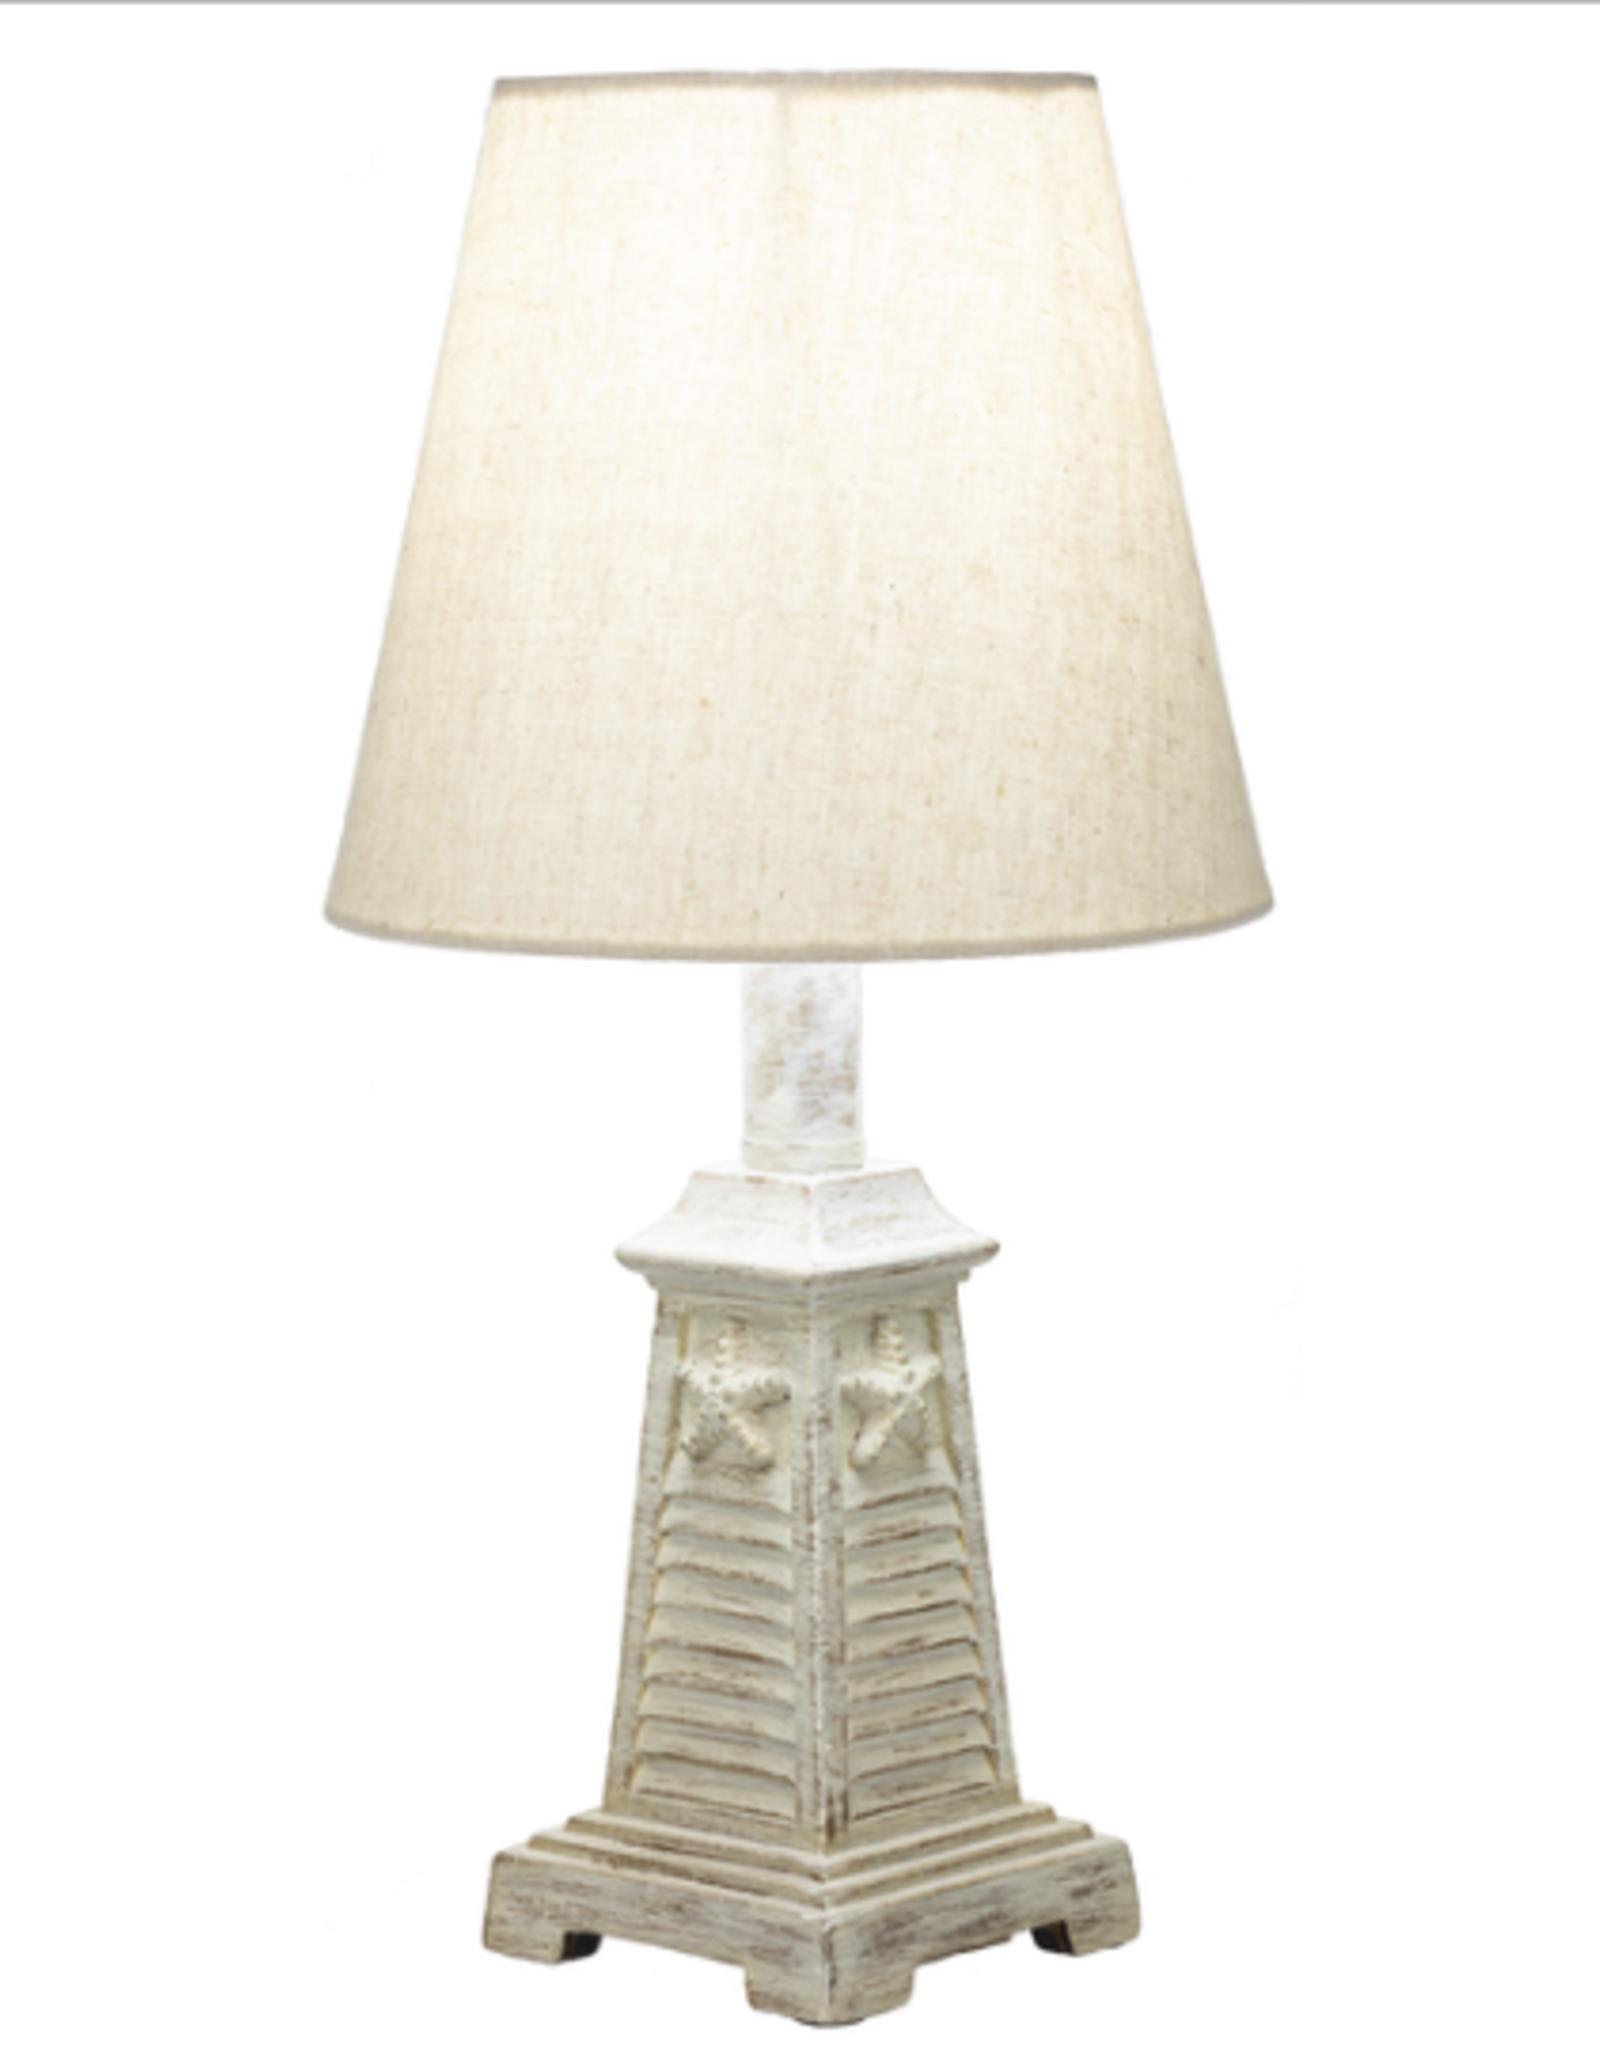 Lamp Ganz Whitewash Starfish Shutter 40W CB174376